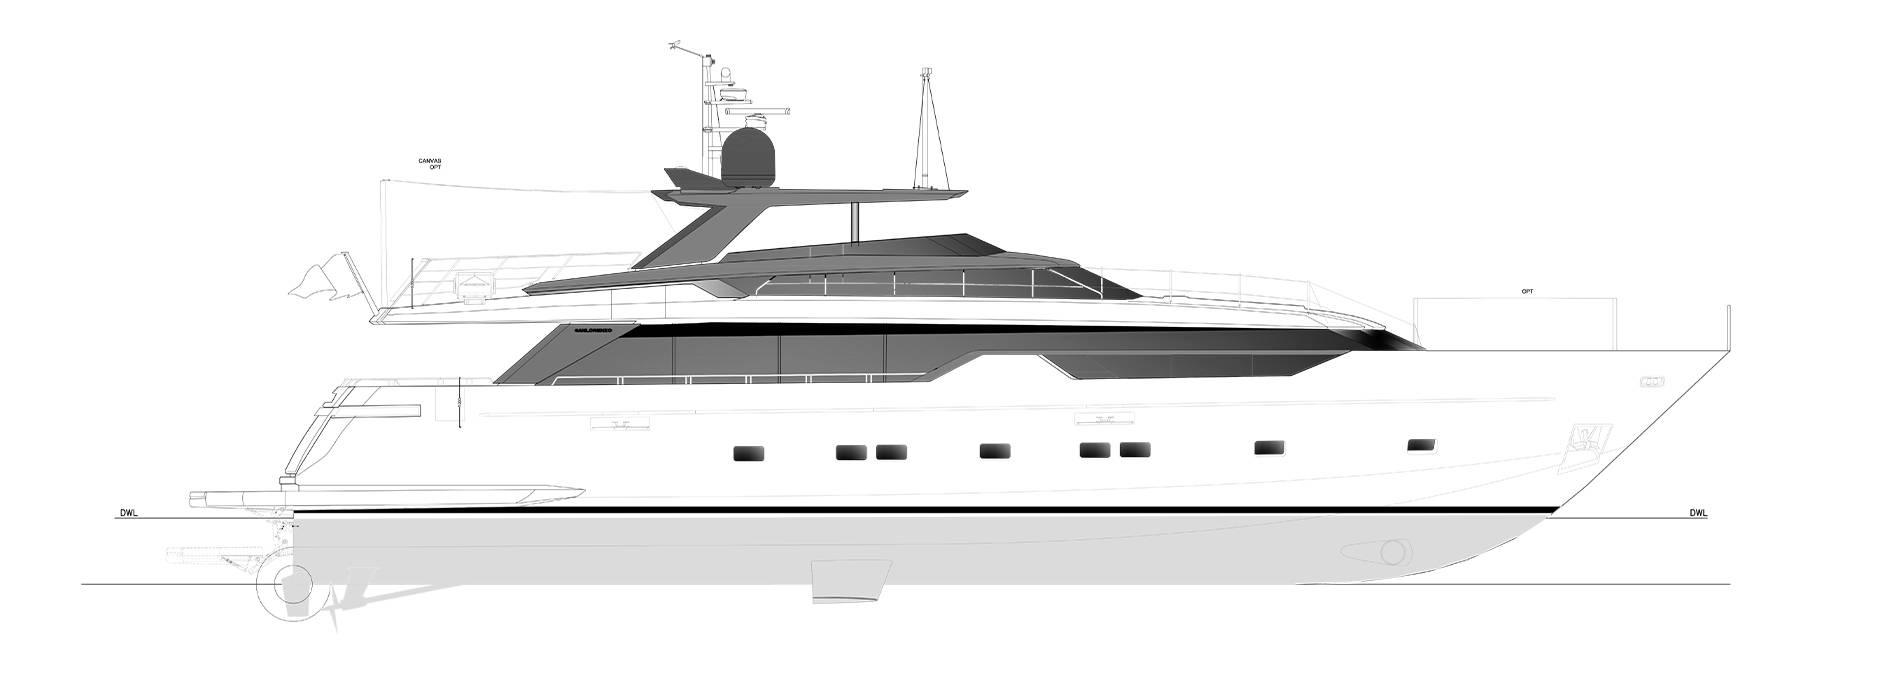 Sanlorenzo Yachts SL102A-746 under offer Perfil